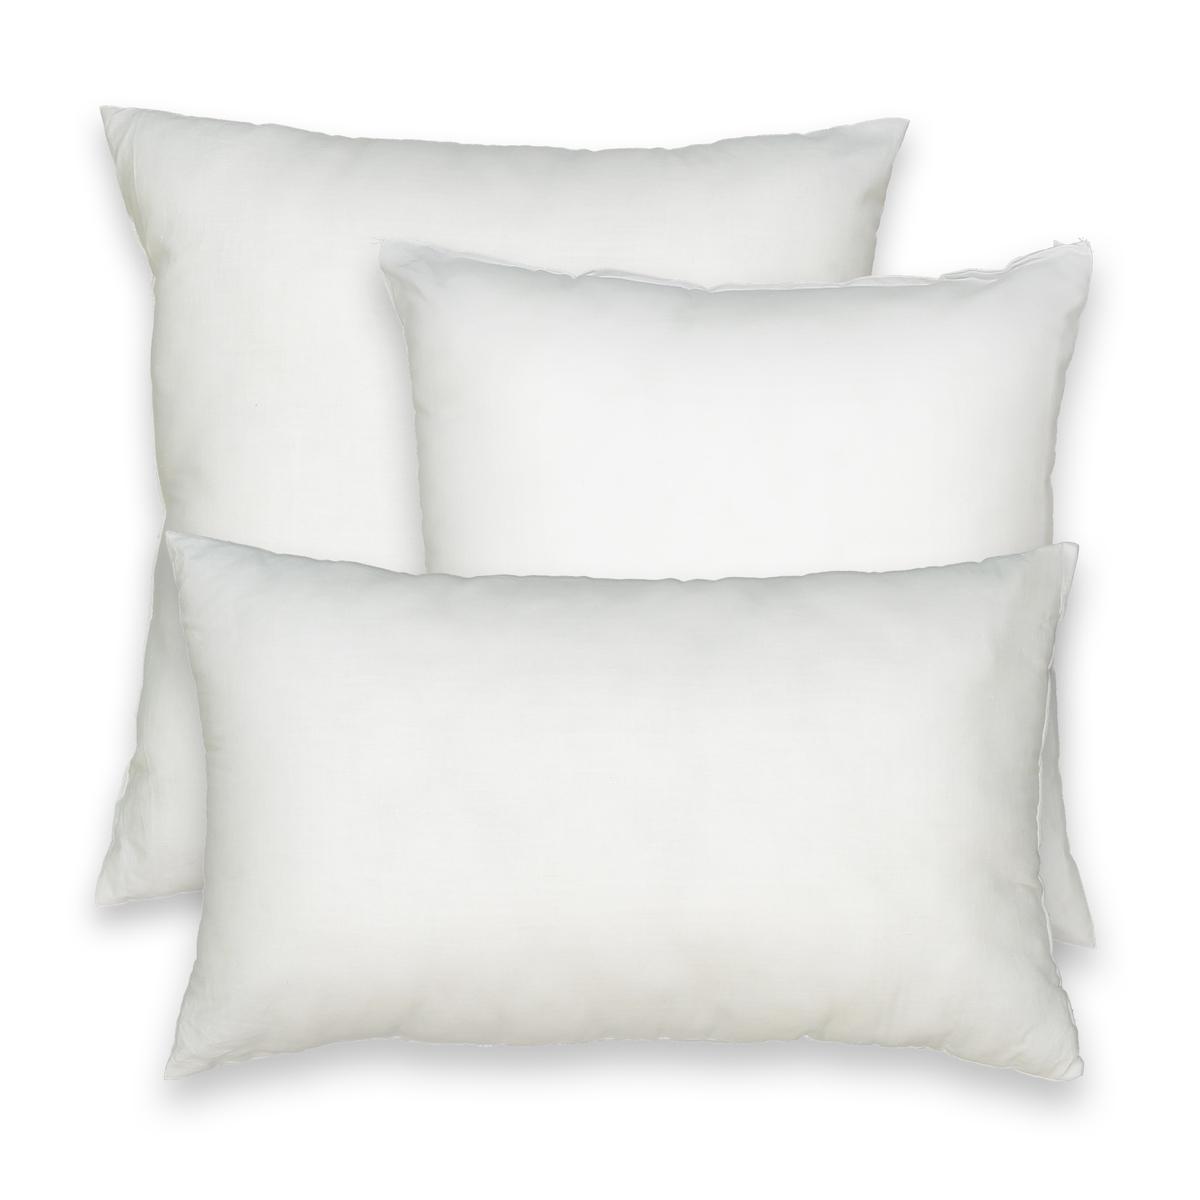 Подушка La Redoute Terra 40 x 40 см белый чехол la redoute для подушки eppaloc 45 x 45 см оранжевый